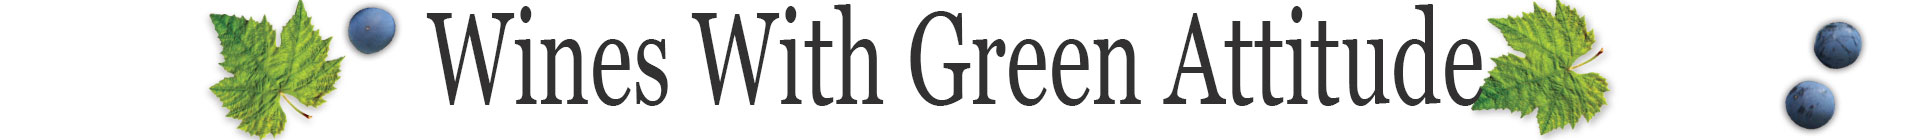 Green-Attitudes-Divider--wines-with-green-attitude